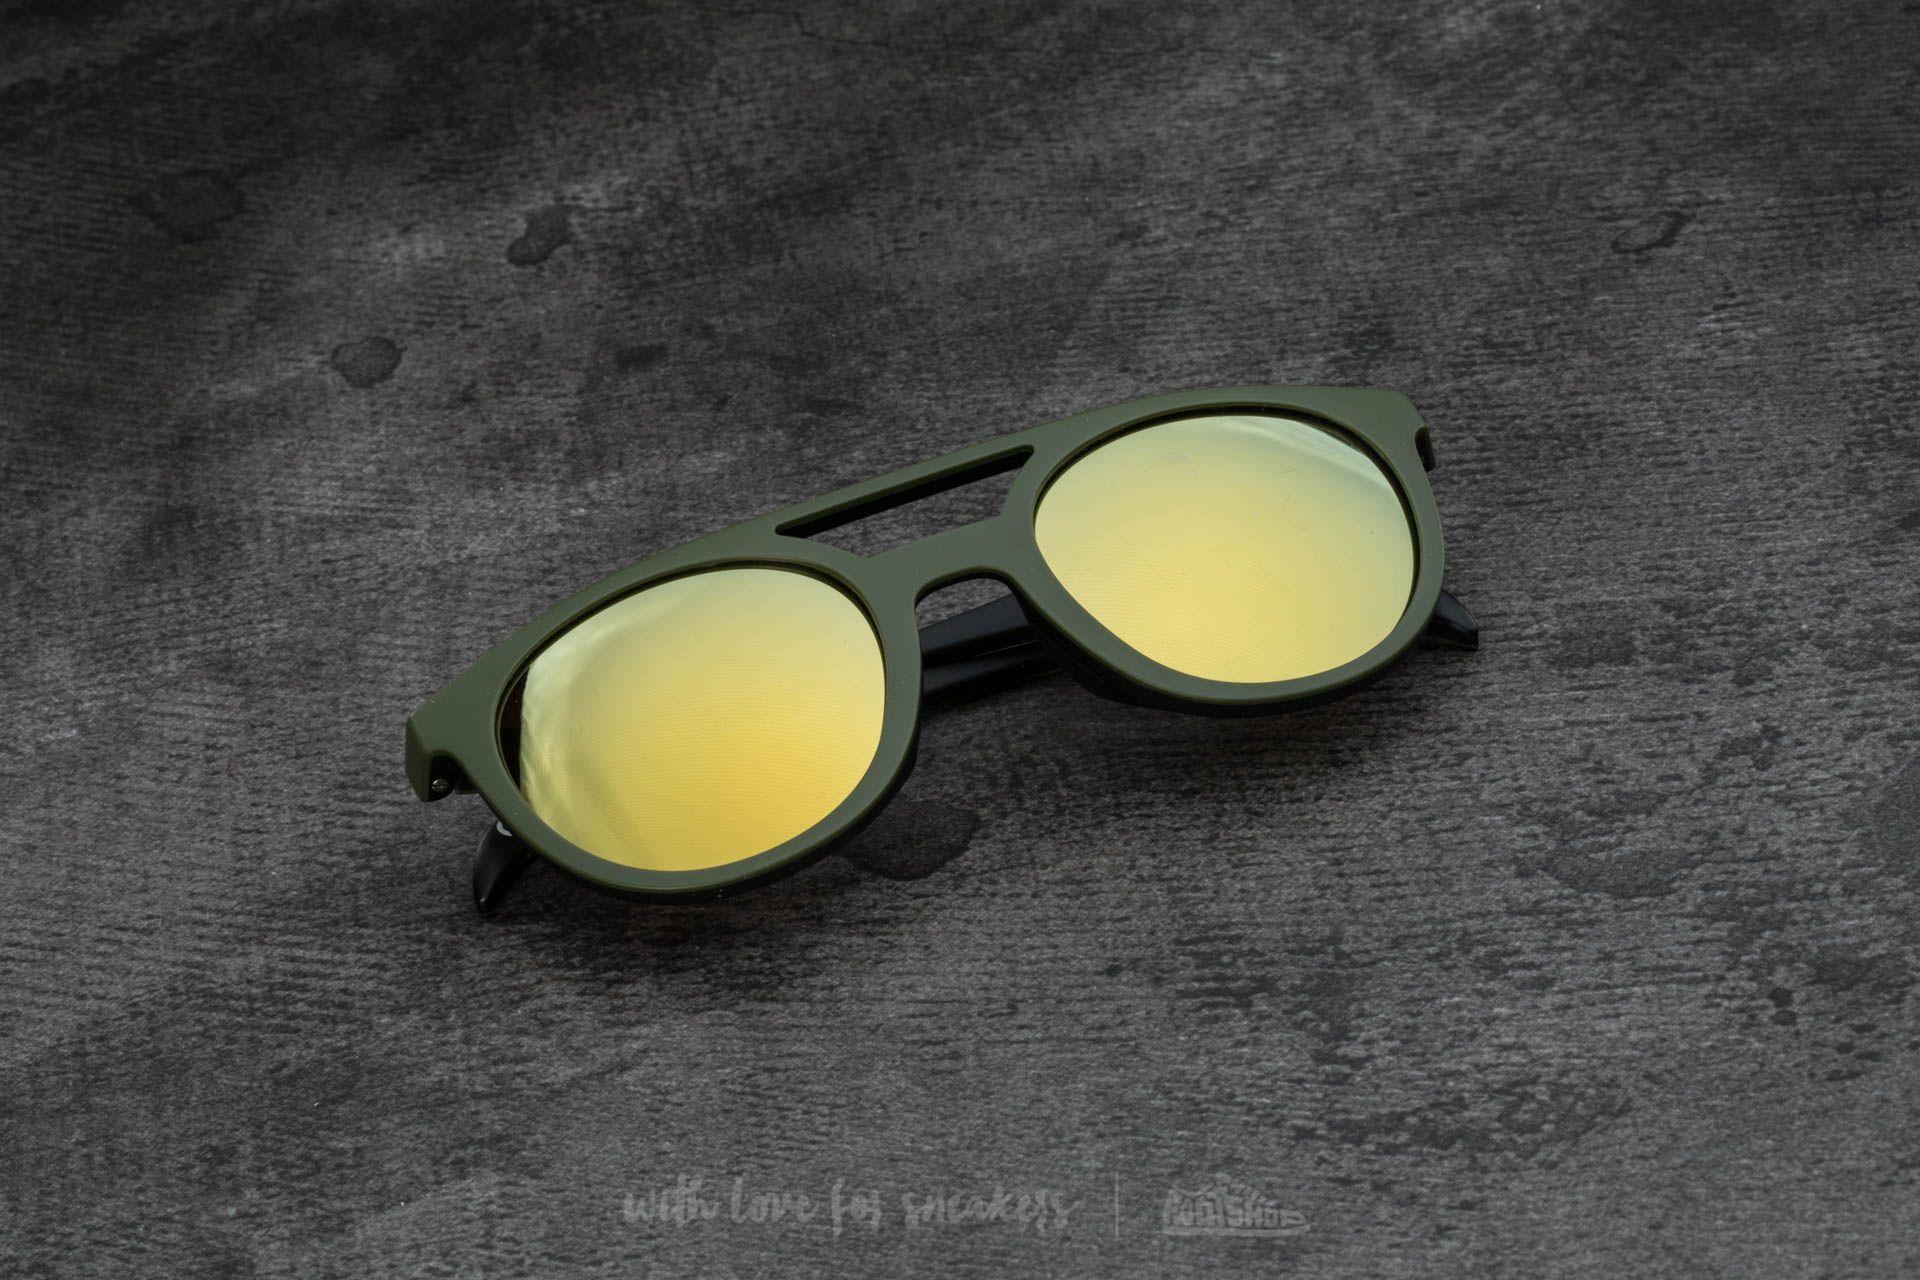 adidas x Italia Independent AOR001 Sunglasses Black/ Sky Led - 15091